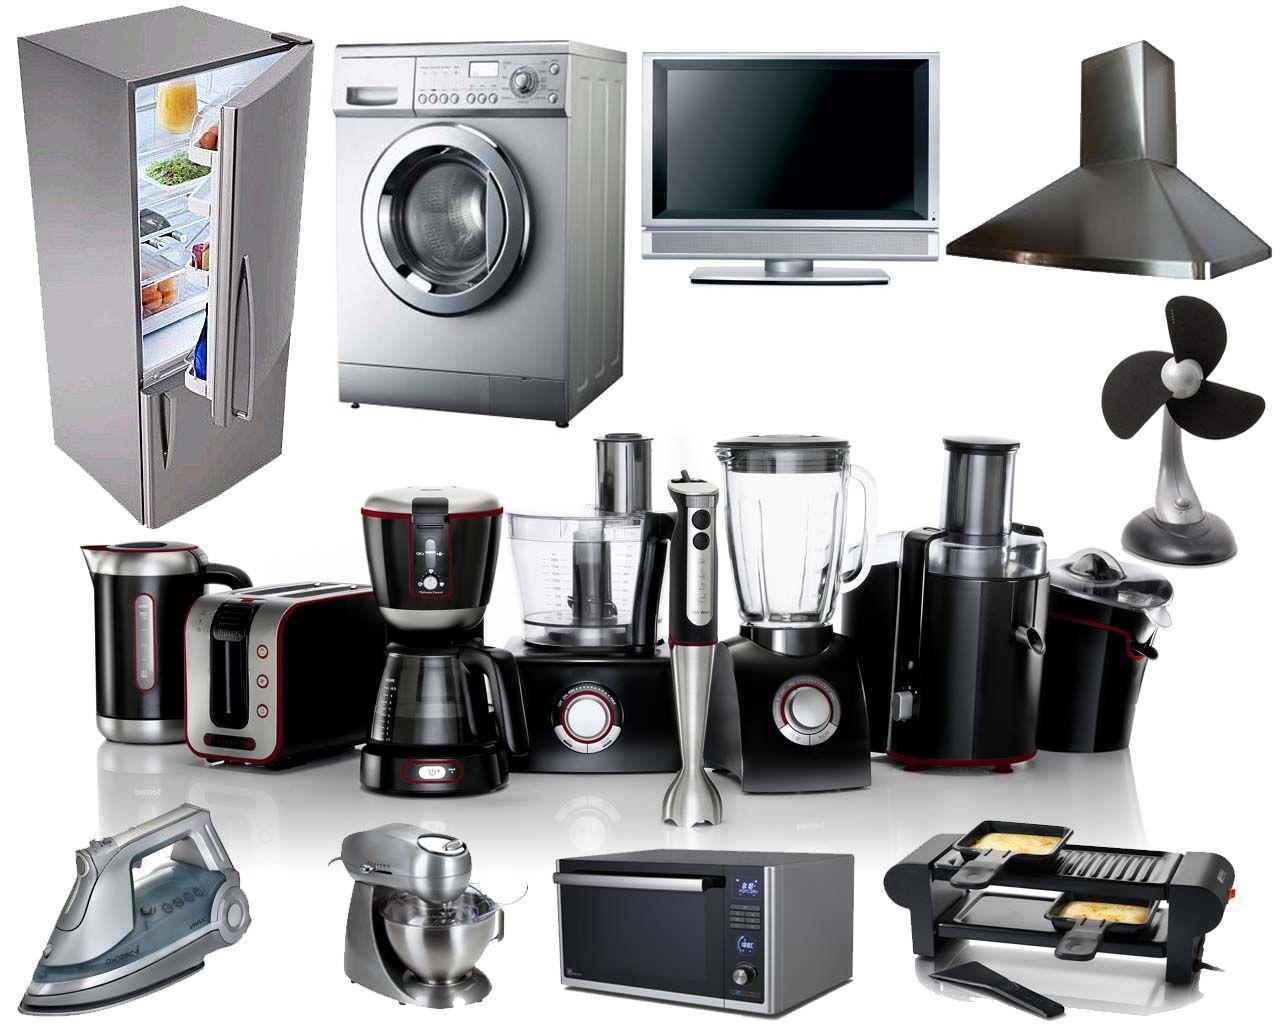 Uncategorized Online Kitchen Appliances Shopping India kitchen home appliances shopping online in india at best price www